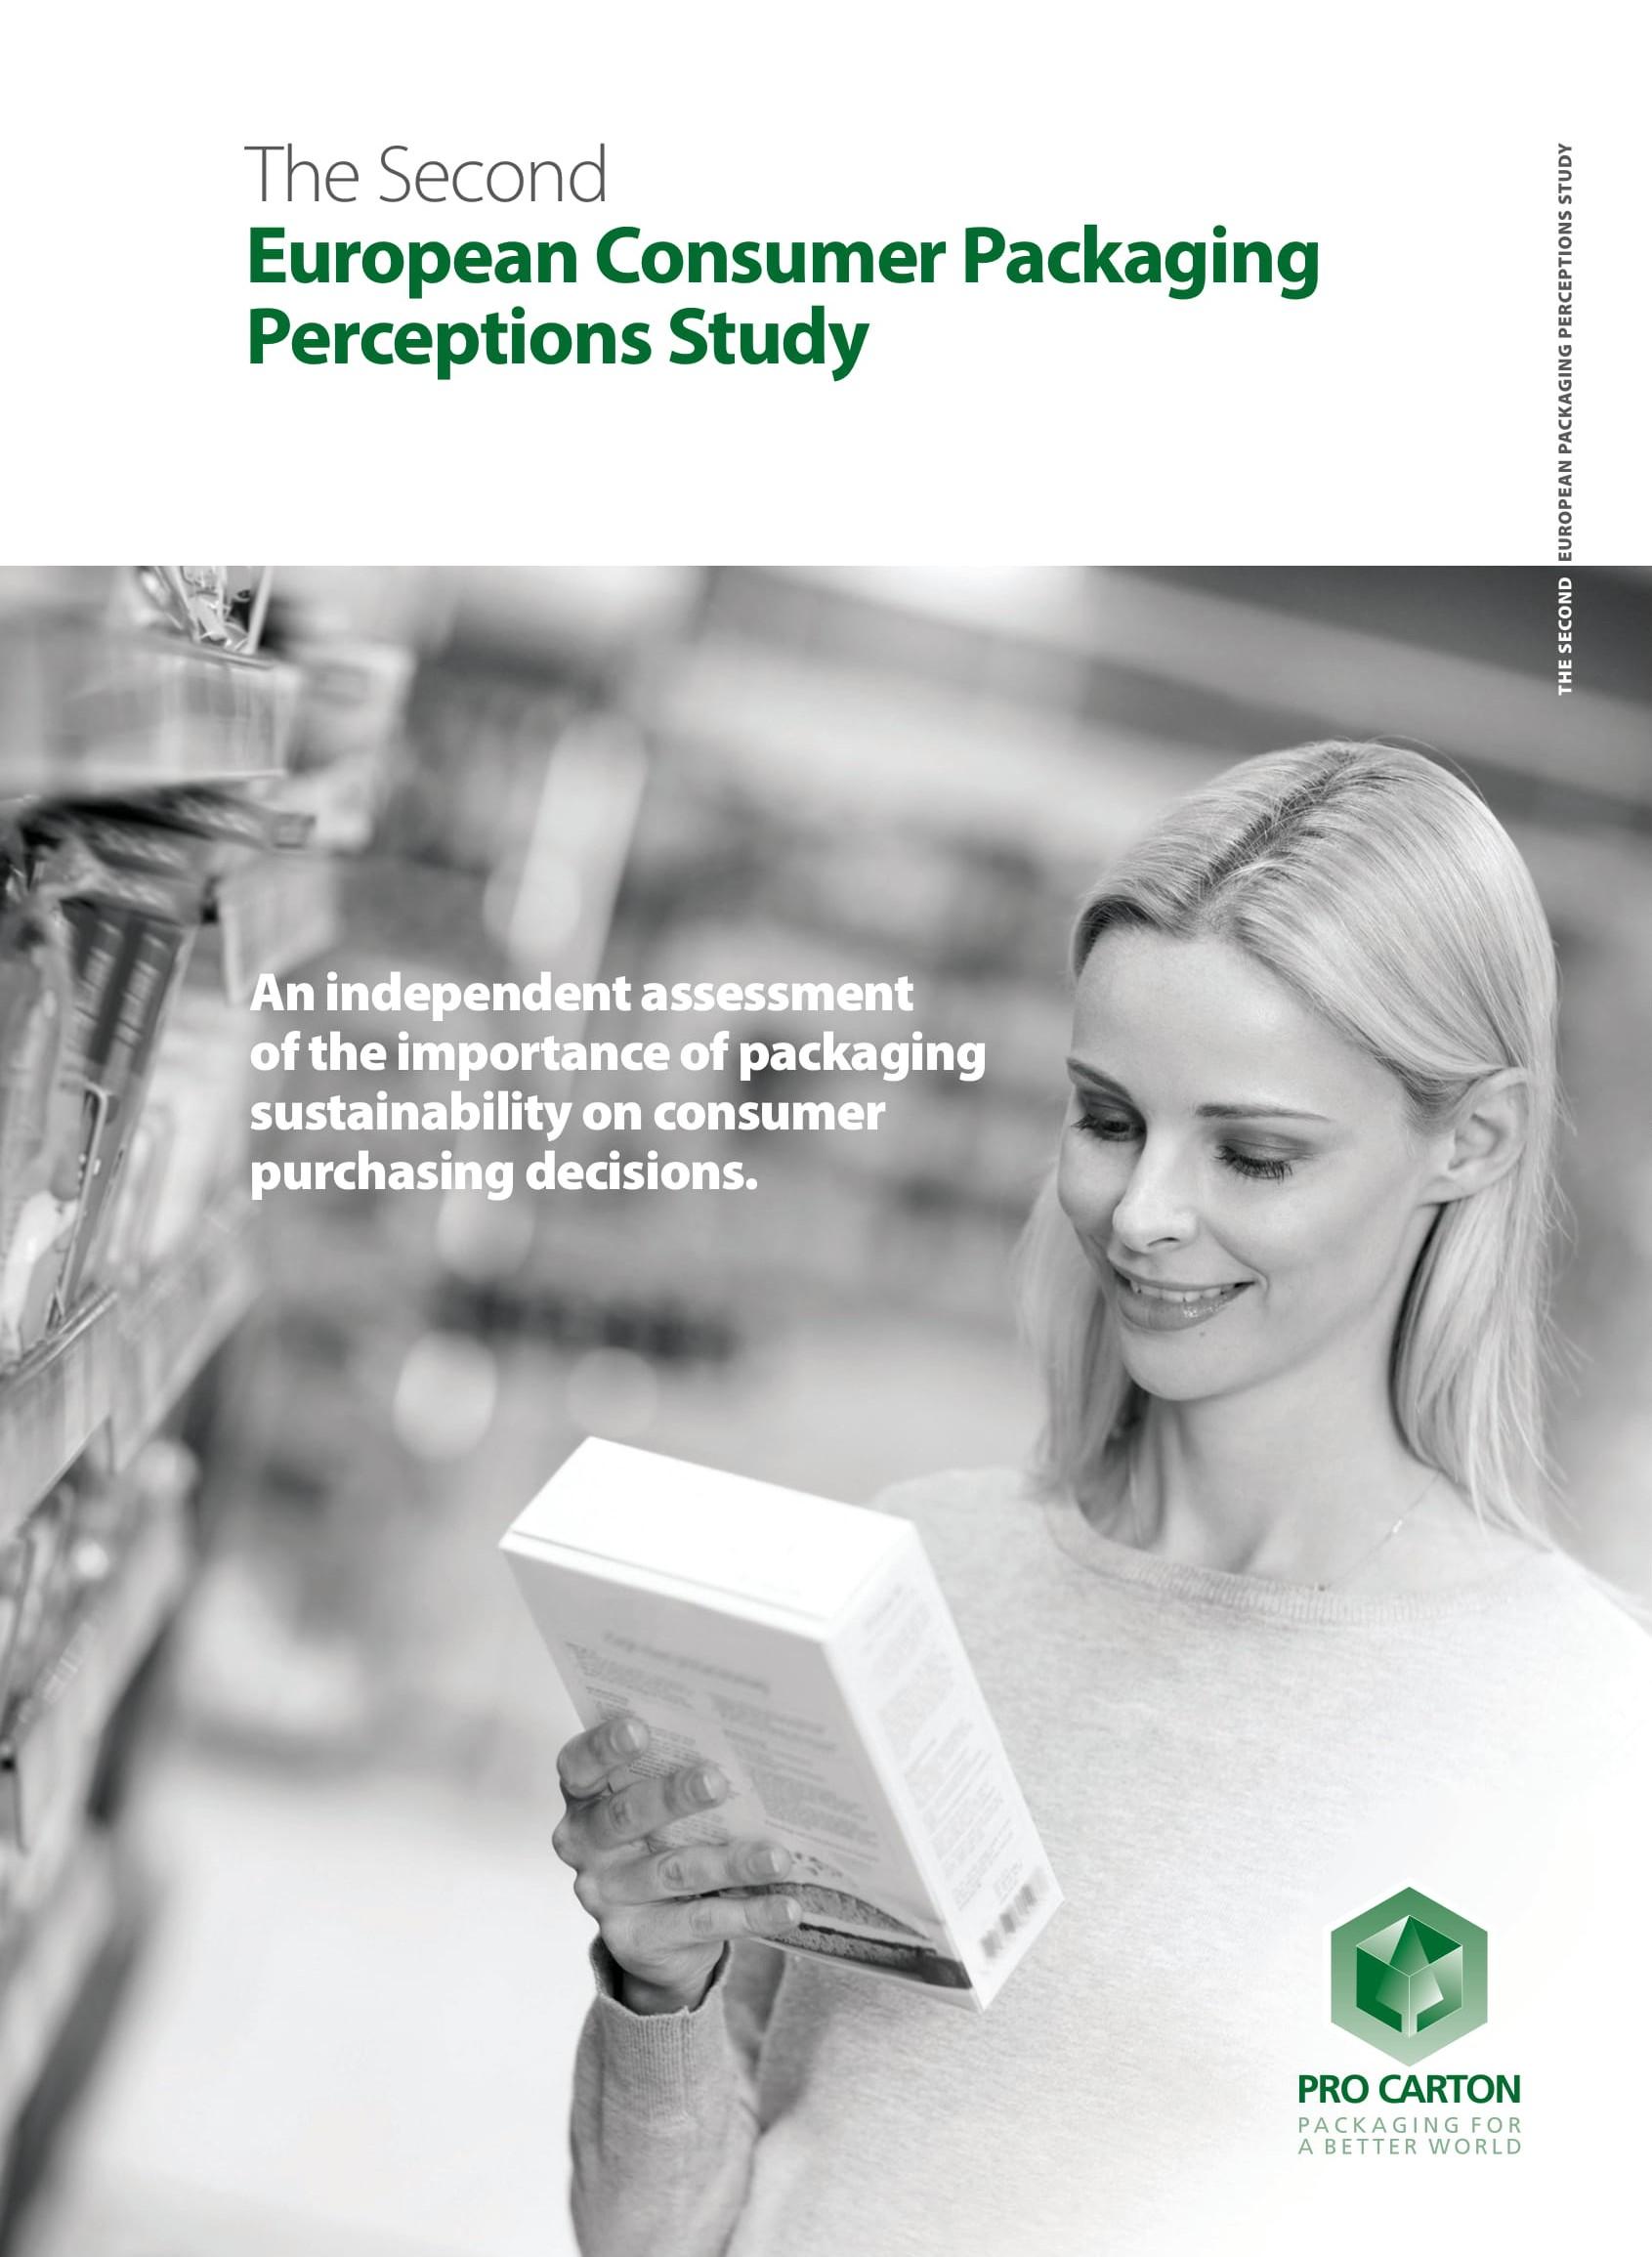 2nd European Consumer Packaging Perceptions Study